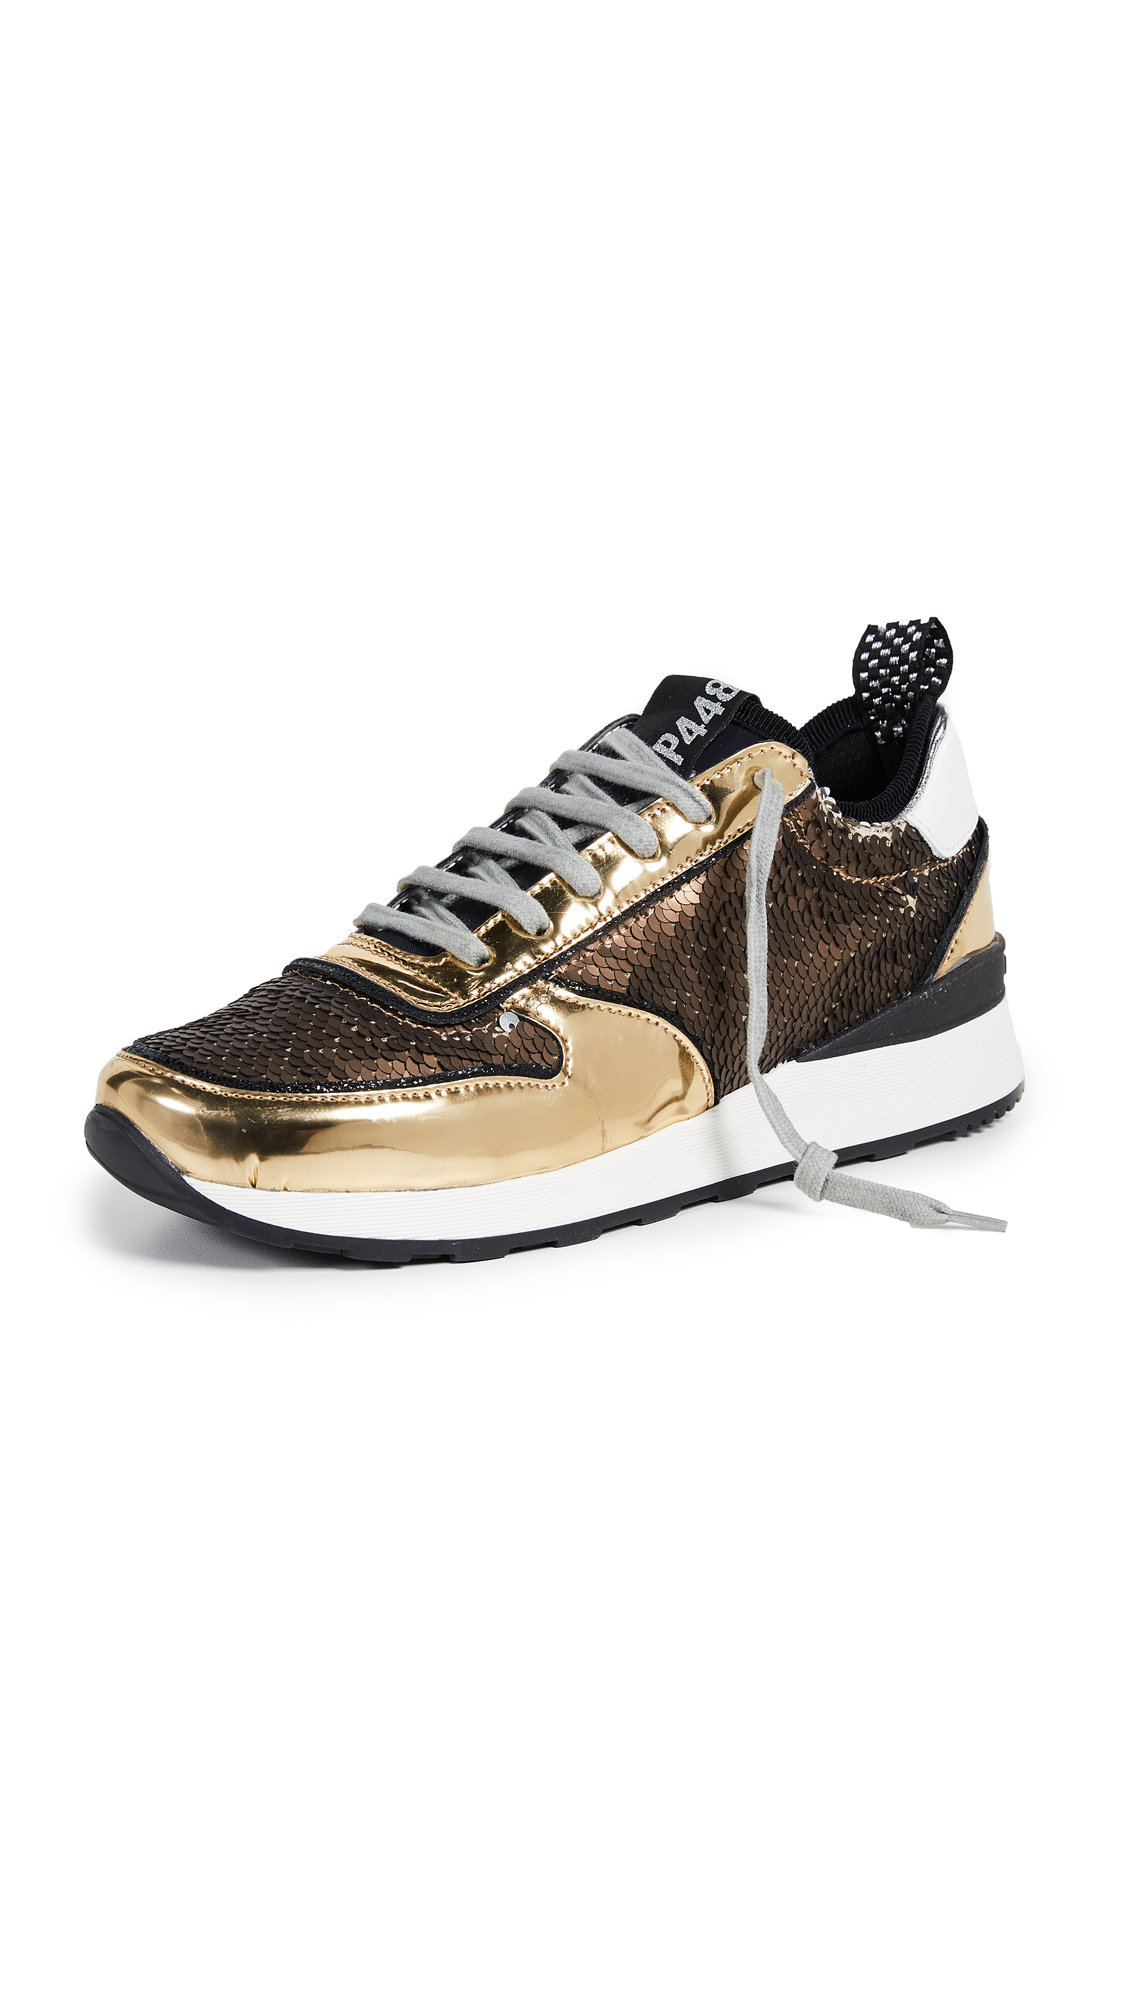 P448 Bostonsocks Sneakers